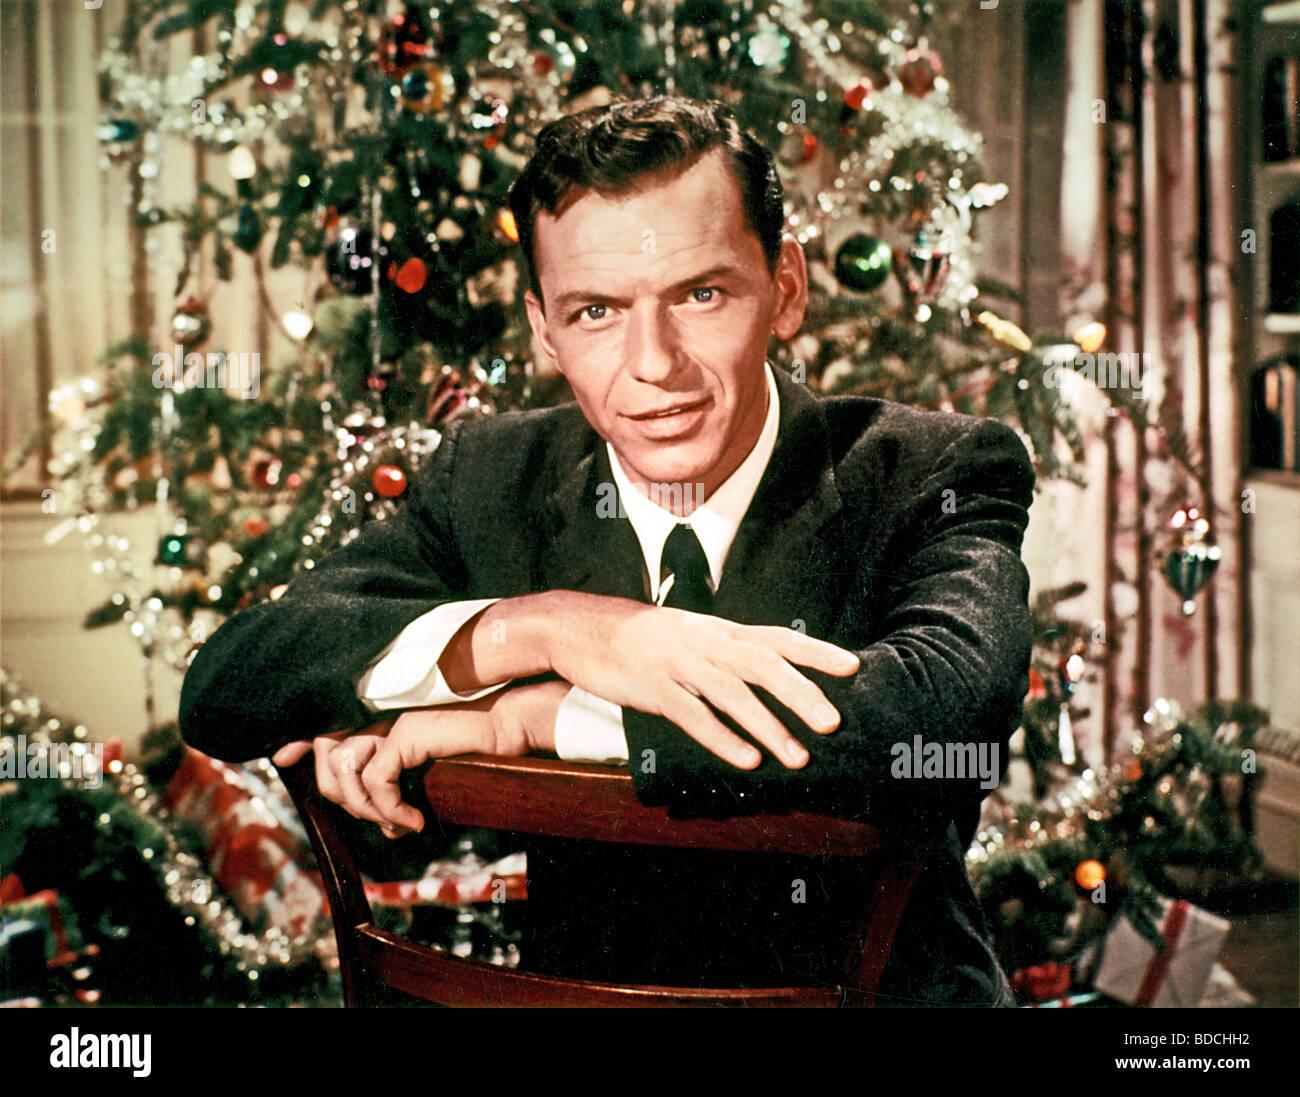 Frank Sinatra Christmas.Frank Sinatra Christmas Stock Photos Frank Sinatra